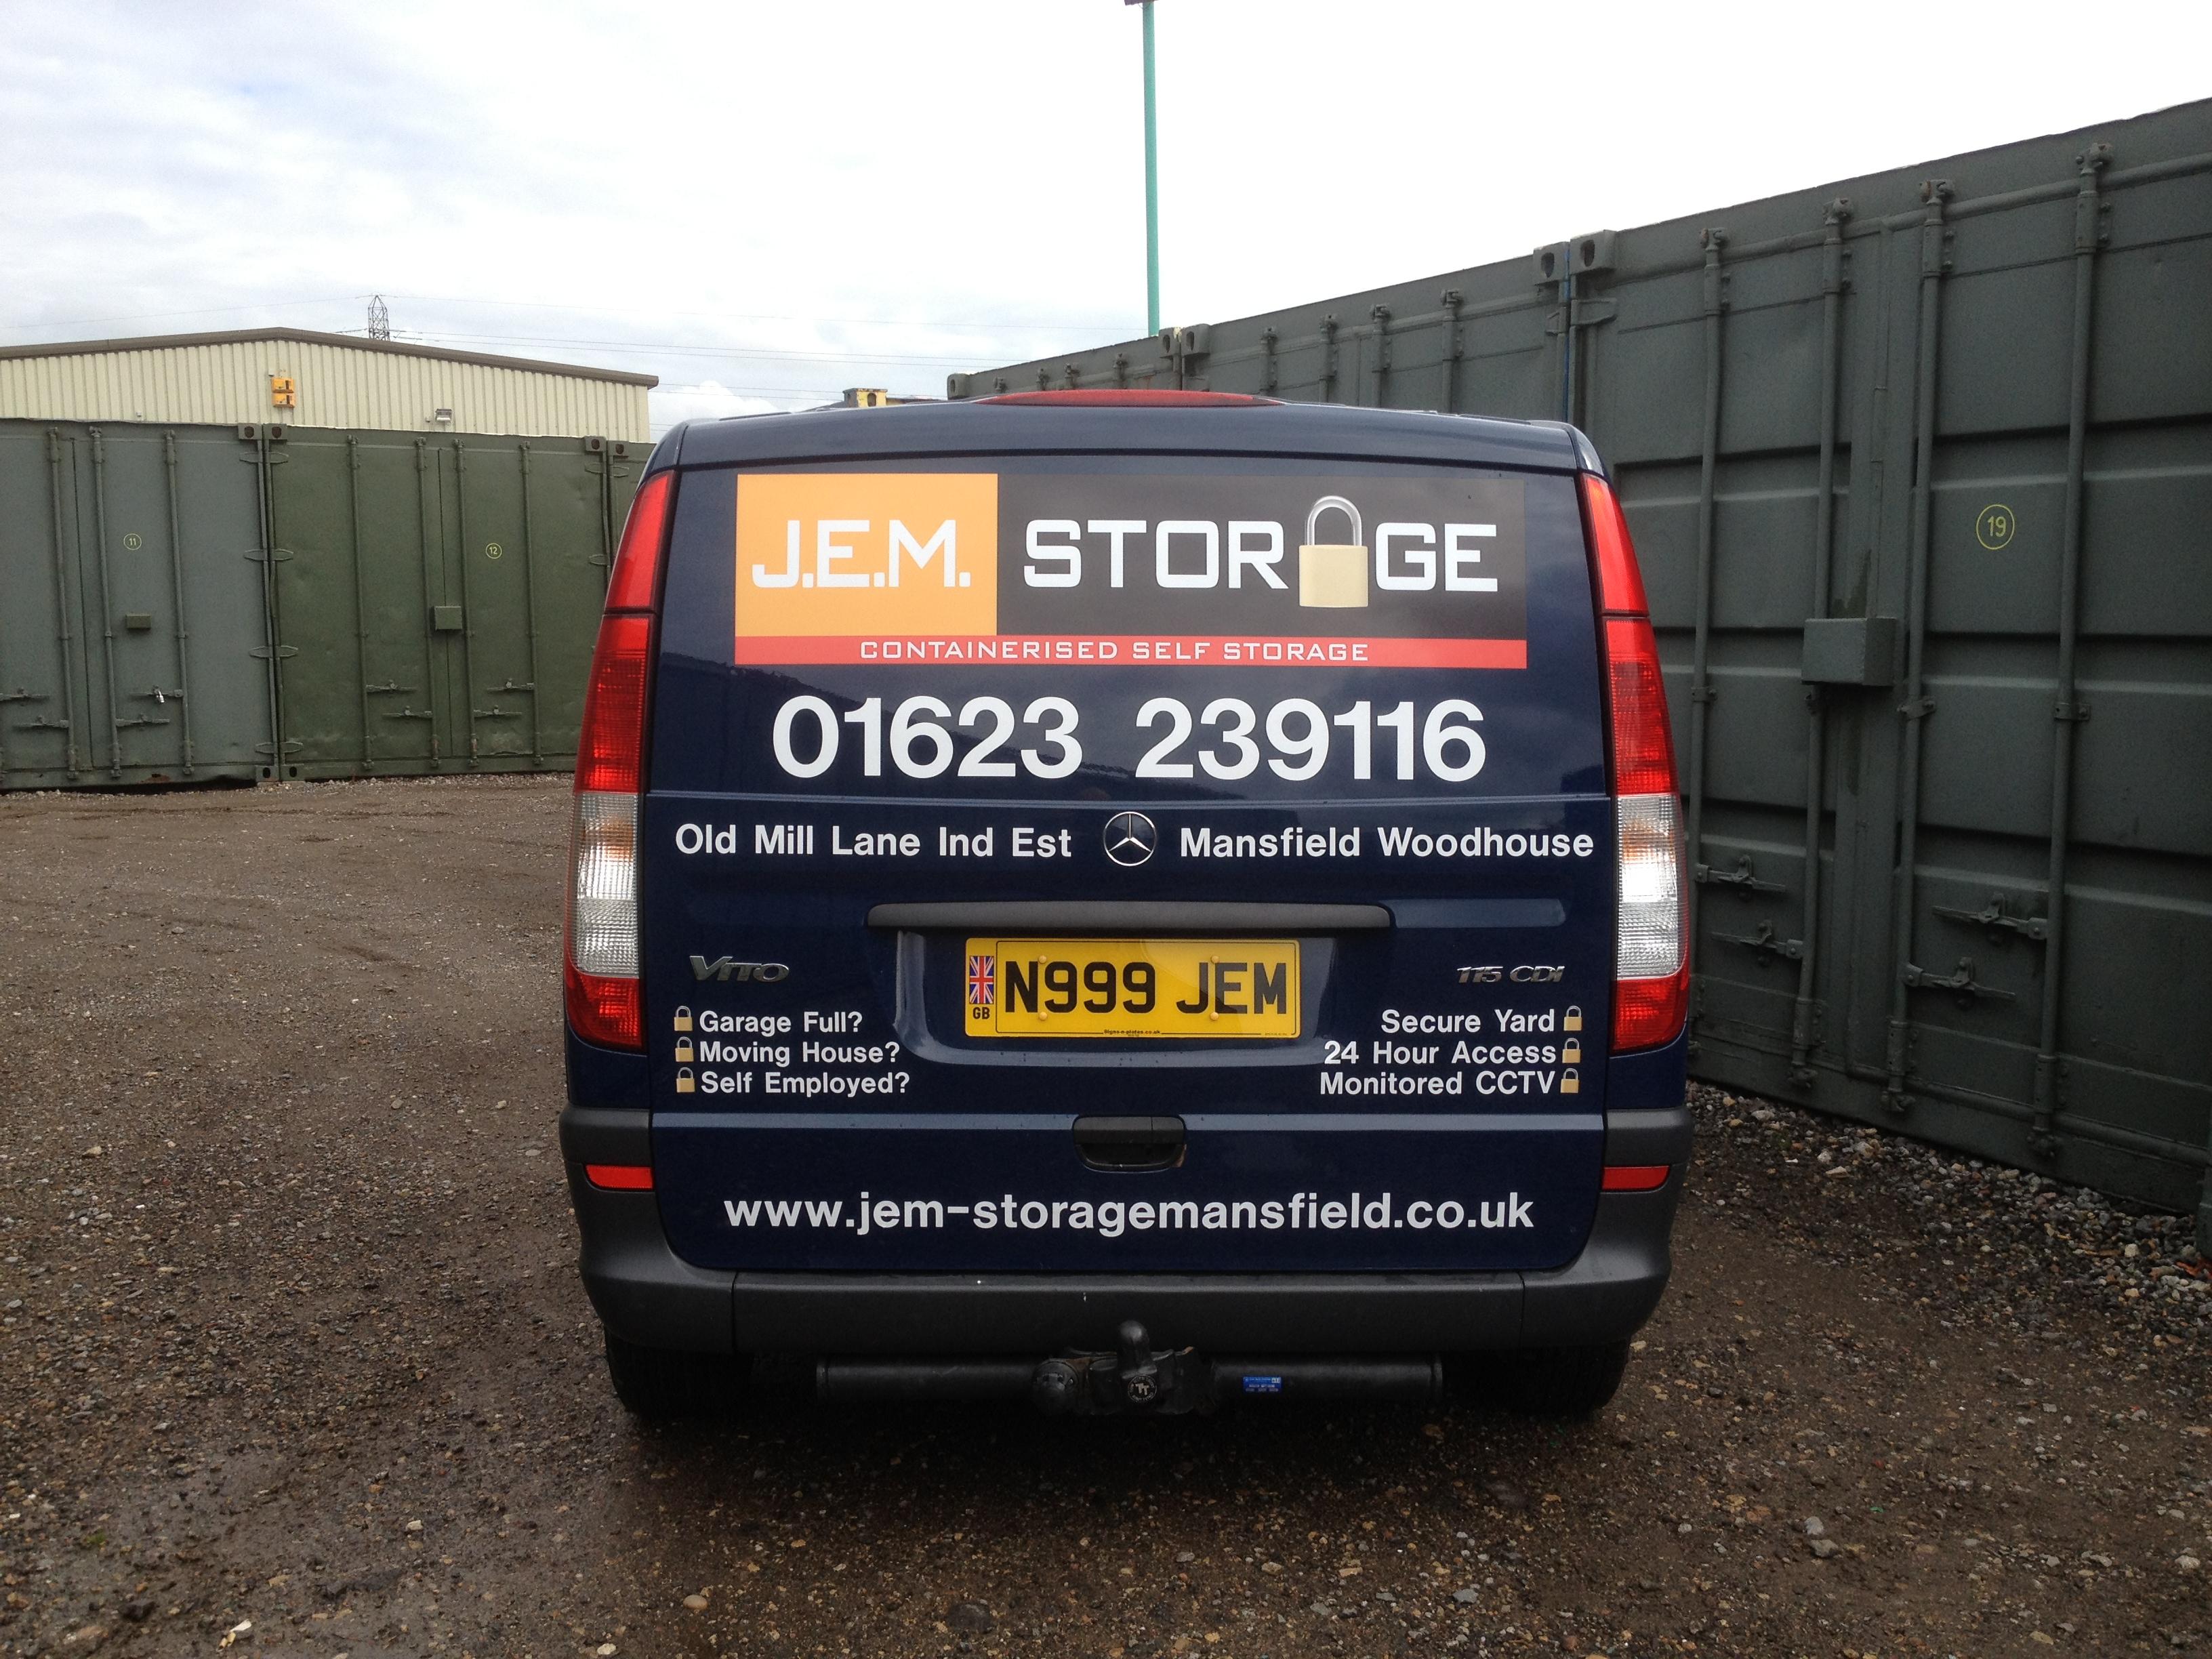 JEM Storage Van